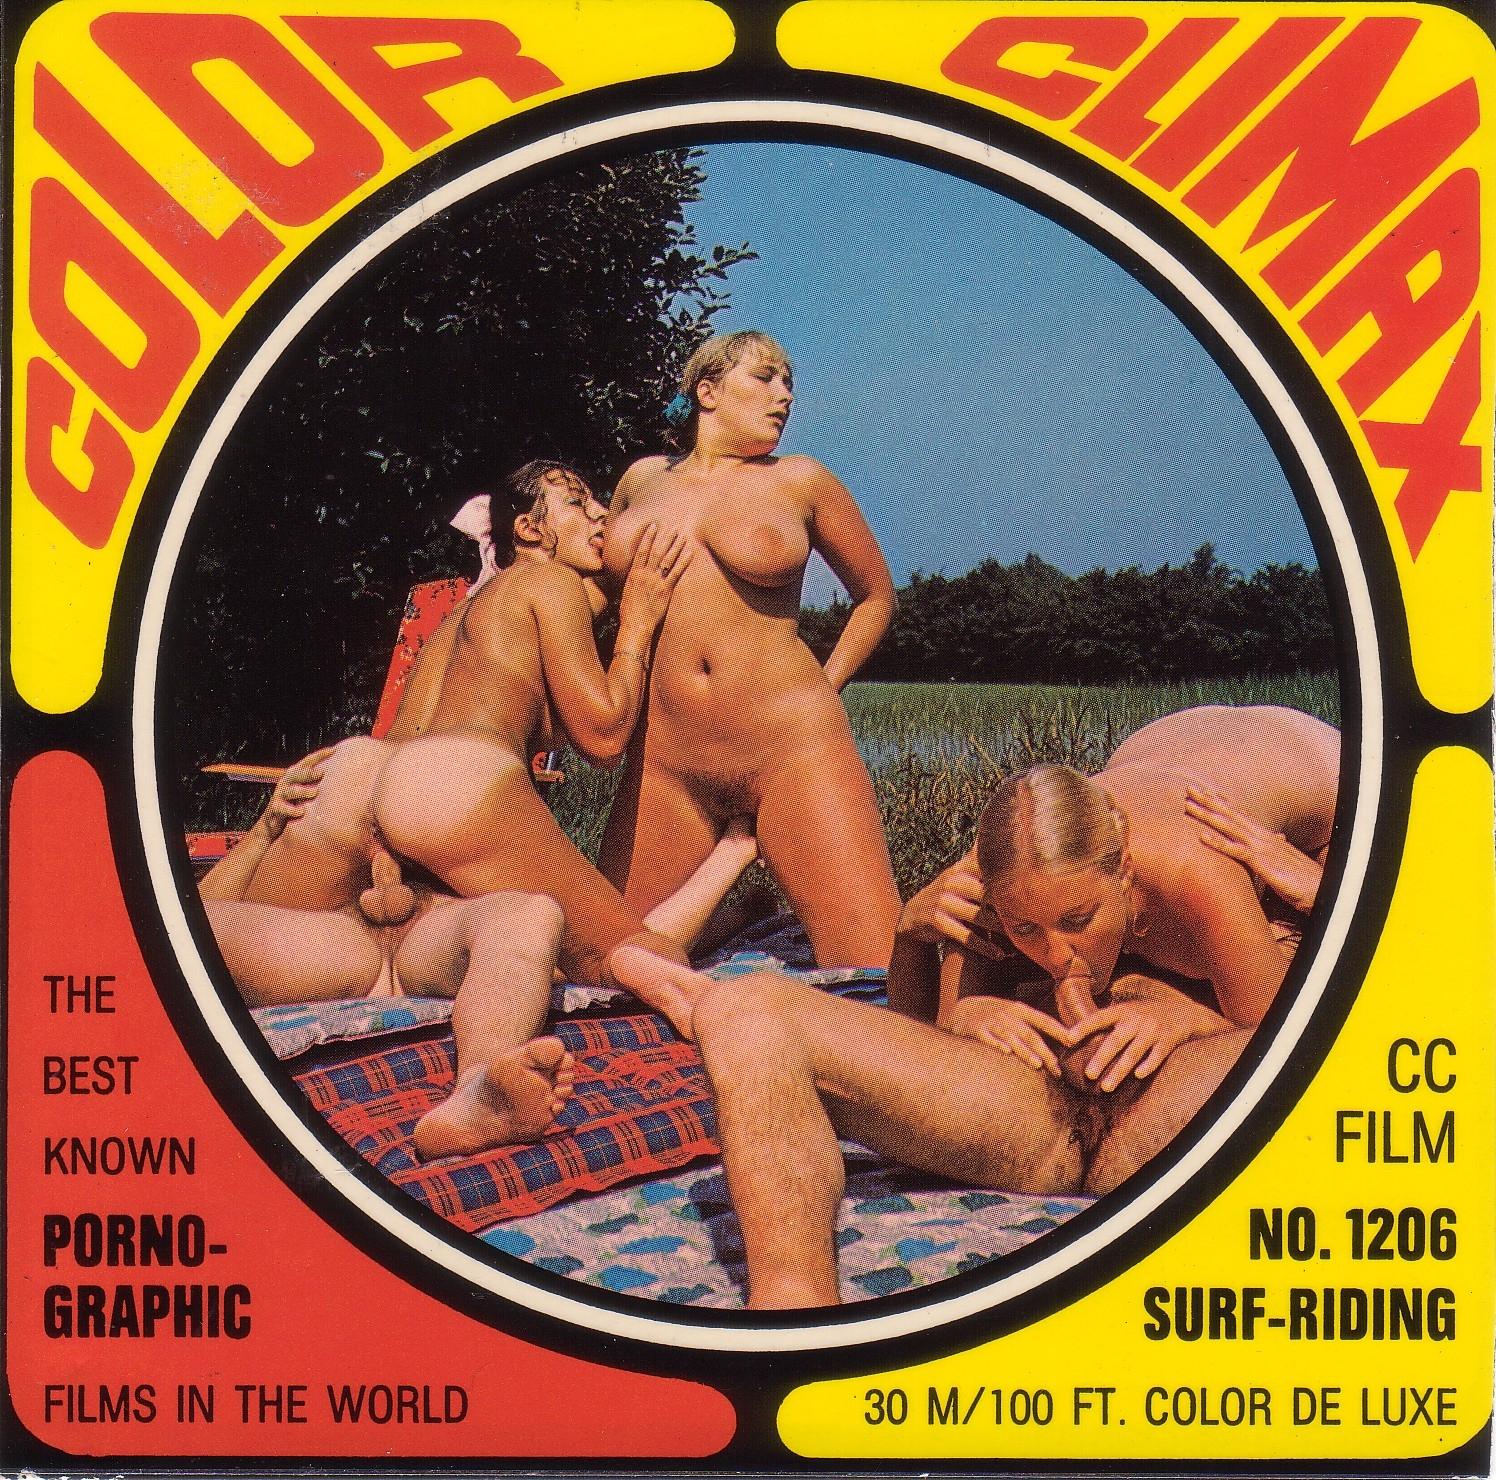 Bar porn vintage copenhagen sex 3 part 5 of 5 - 3 4